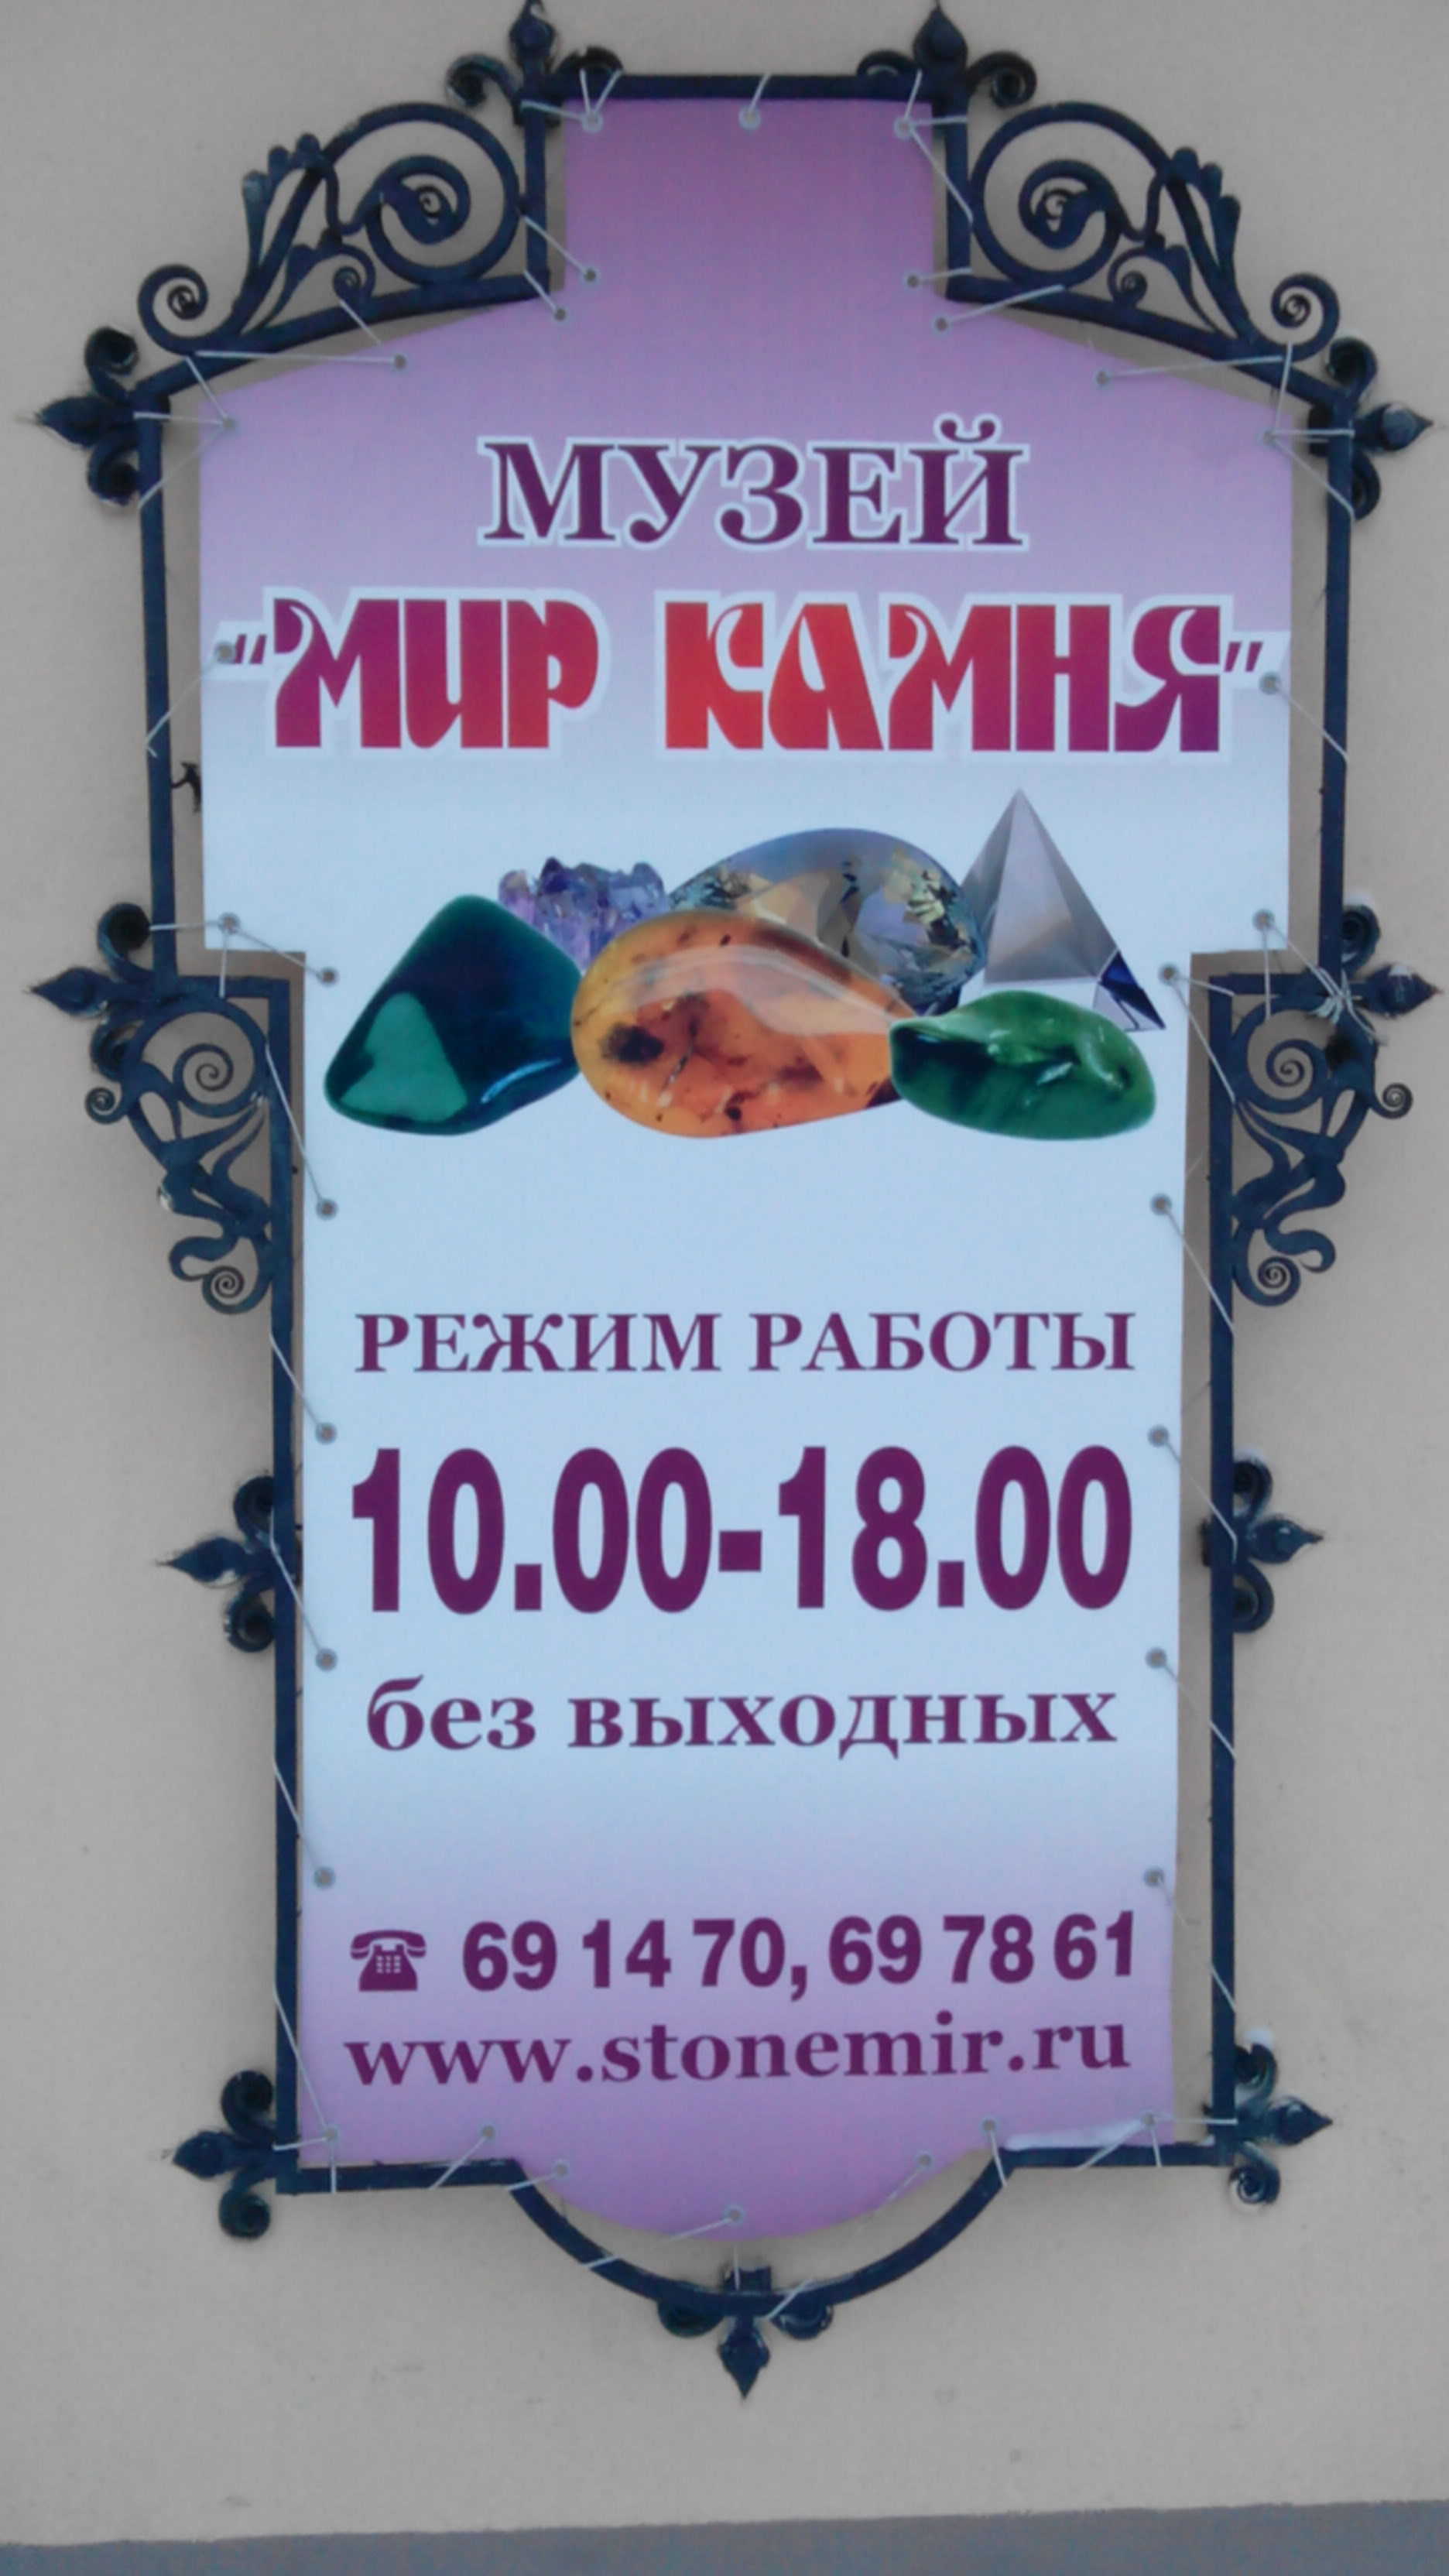 Музей «Мир камня»